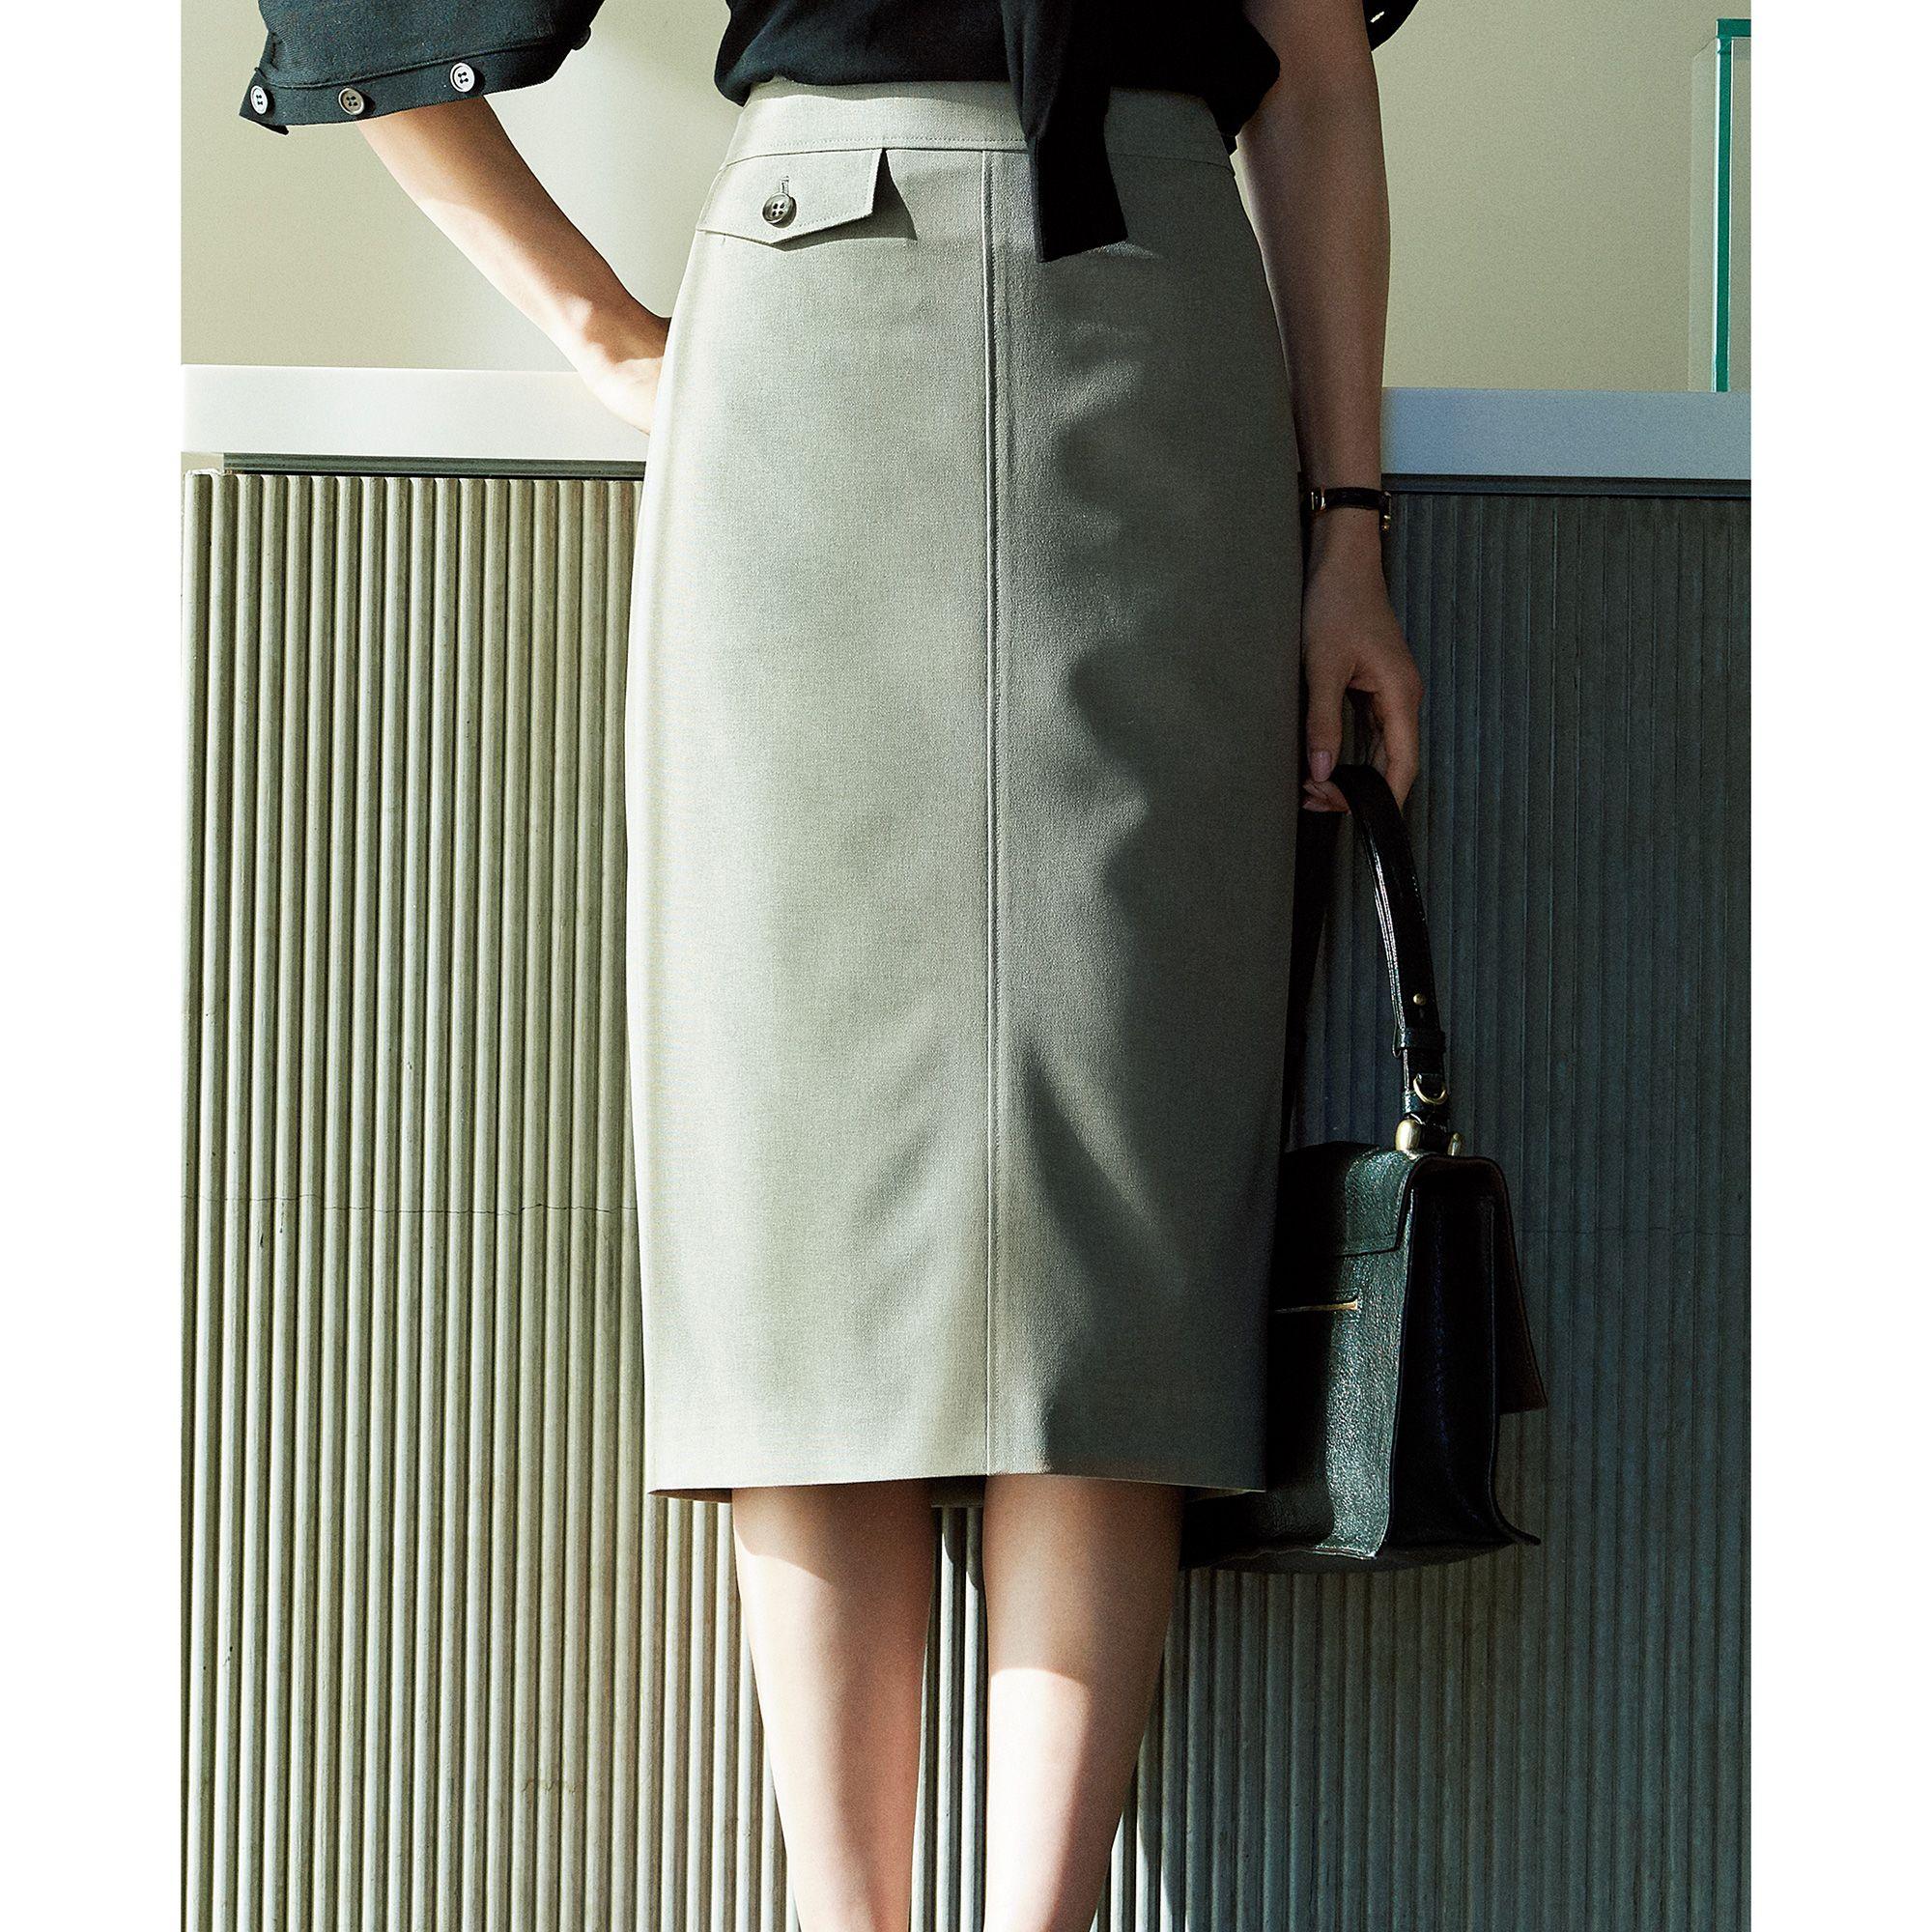 M7days for officeエムセブンデイズフォーオフィス/リネン風タイトスカート